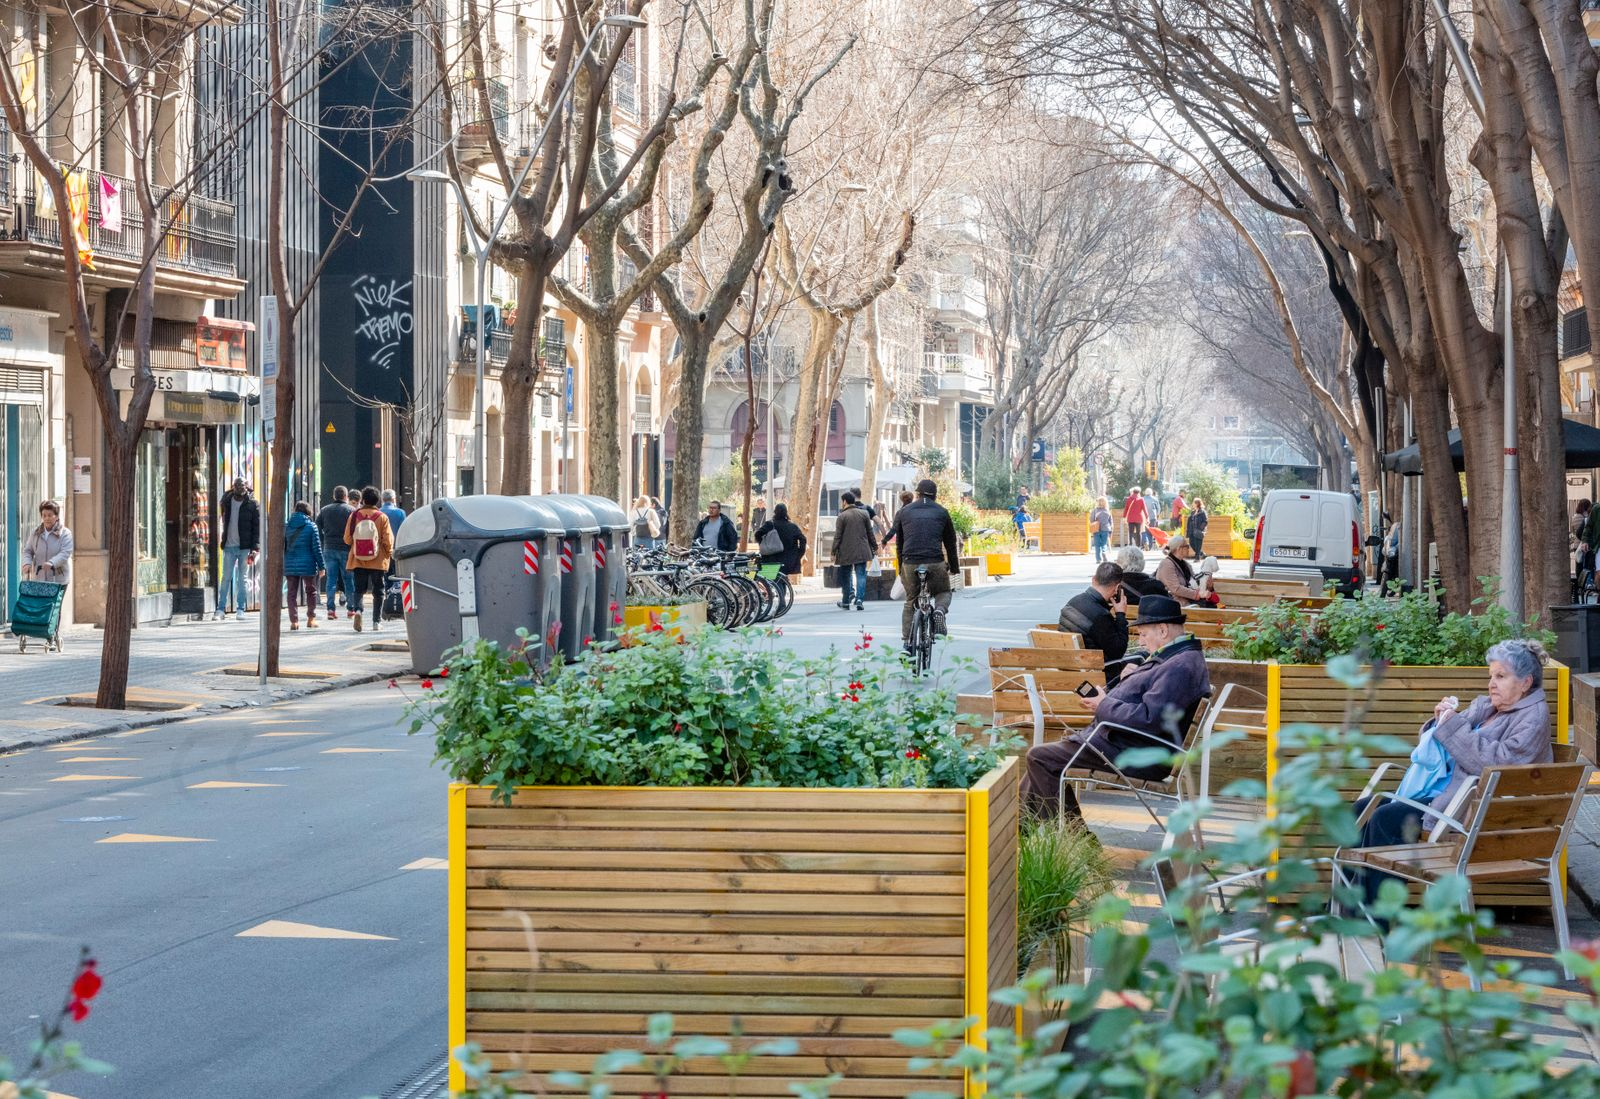 Spanien, Katalonien, Barcelona, Superblock Projekt, Stadtteil Sant Antoni. Verkehrsberuhigte Strasse Conde del Borrel. Die Strasse ist Teil des Superblock Projekts des Sadtteils Sant Antoni.